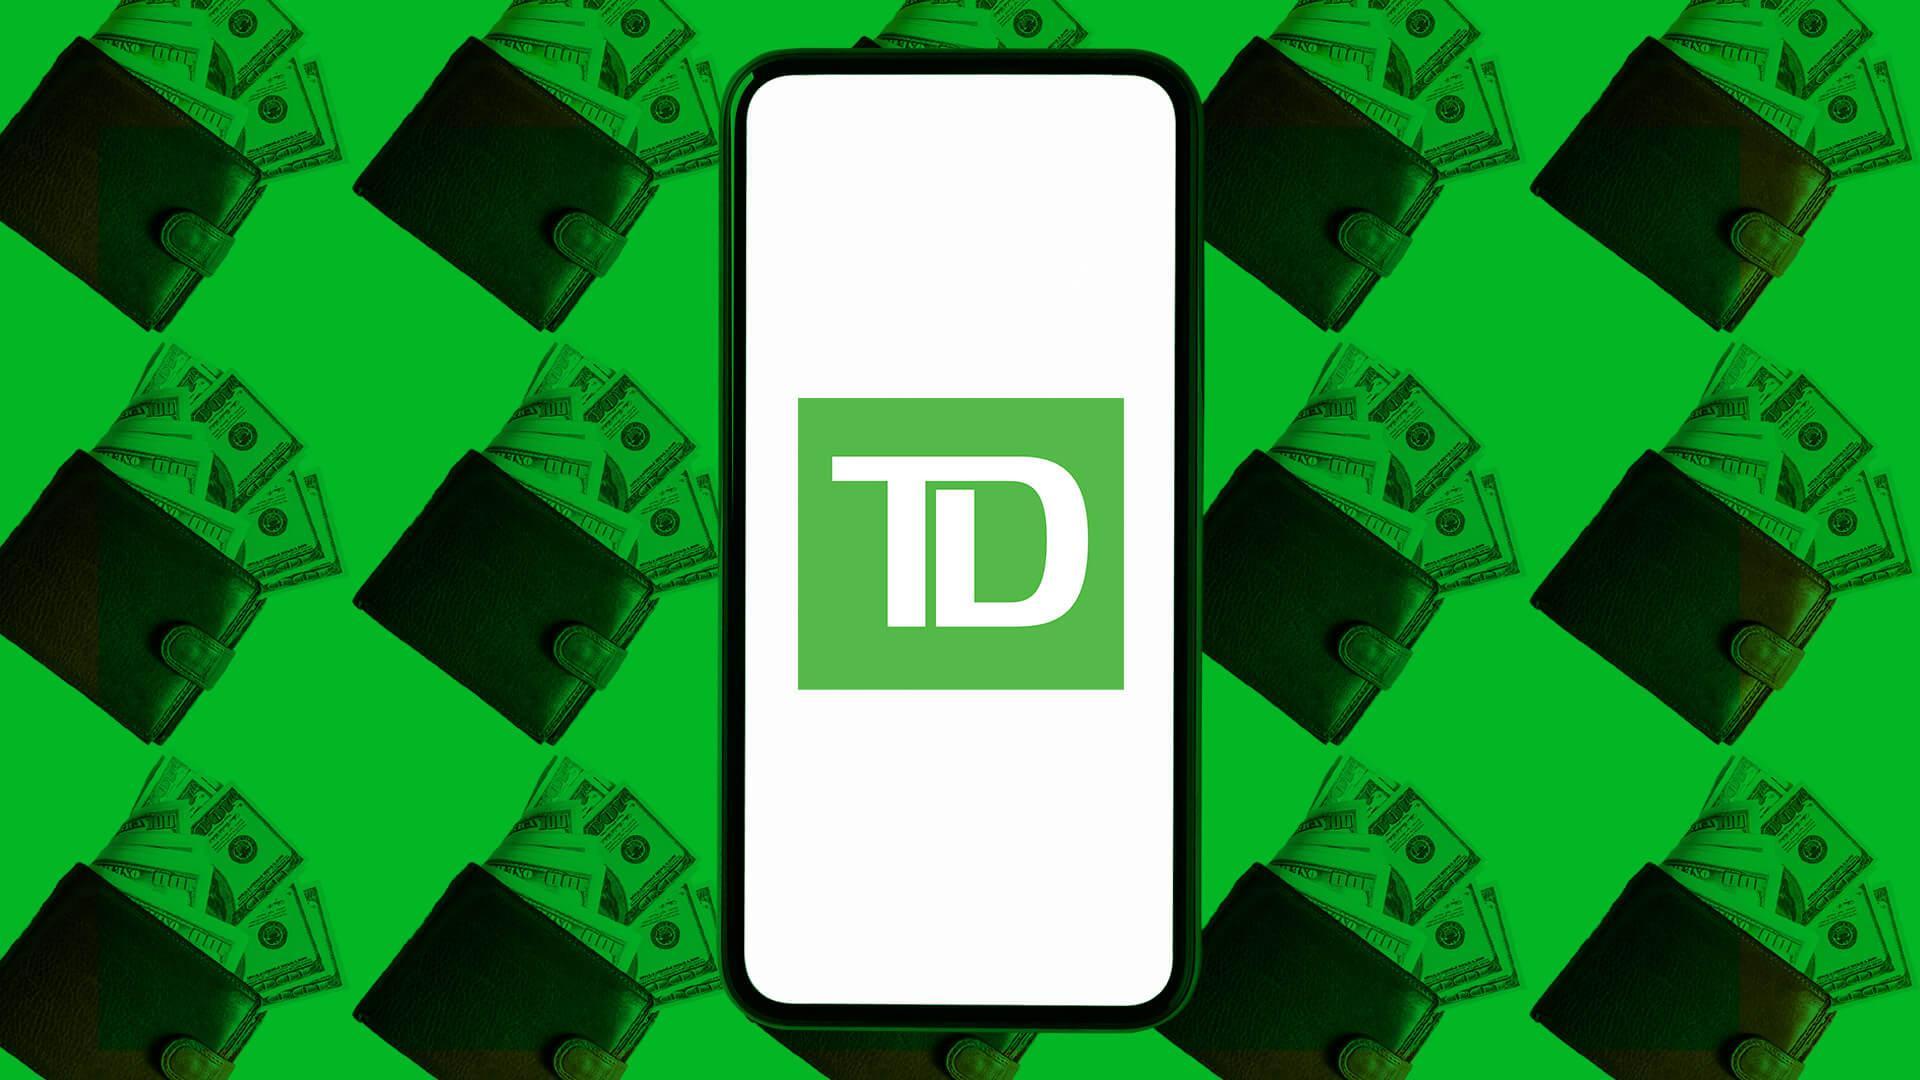 TD Bank overdraft fee